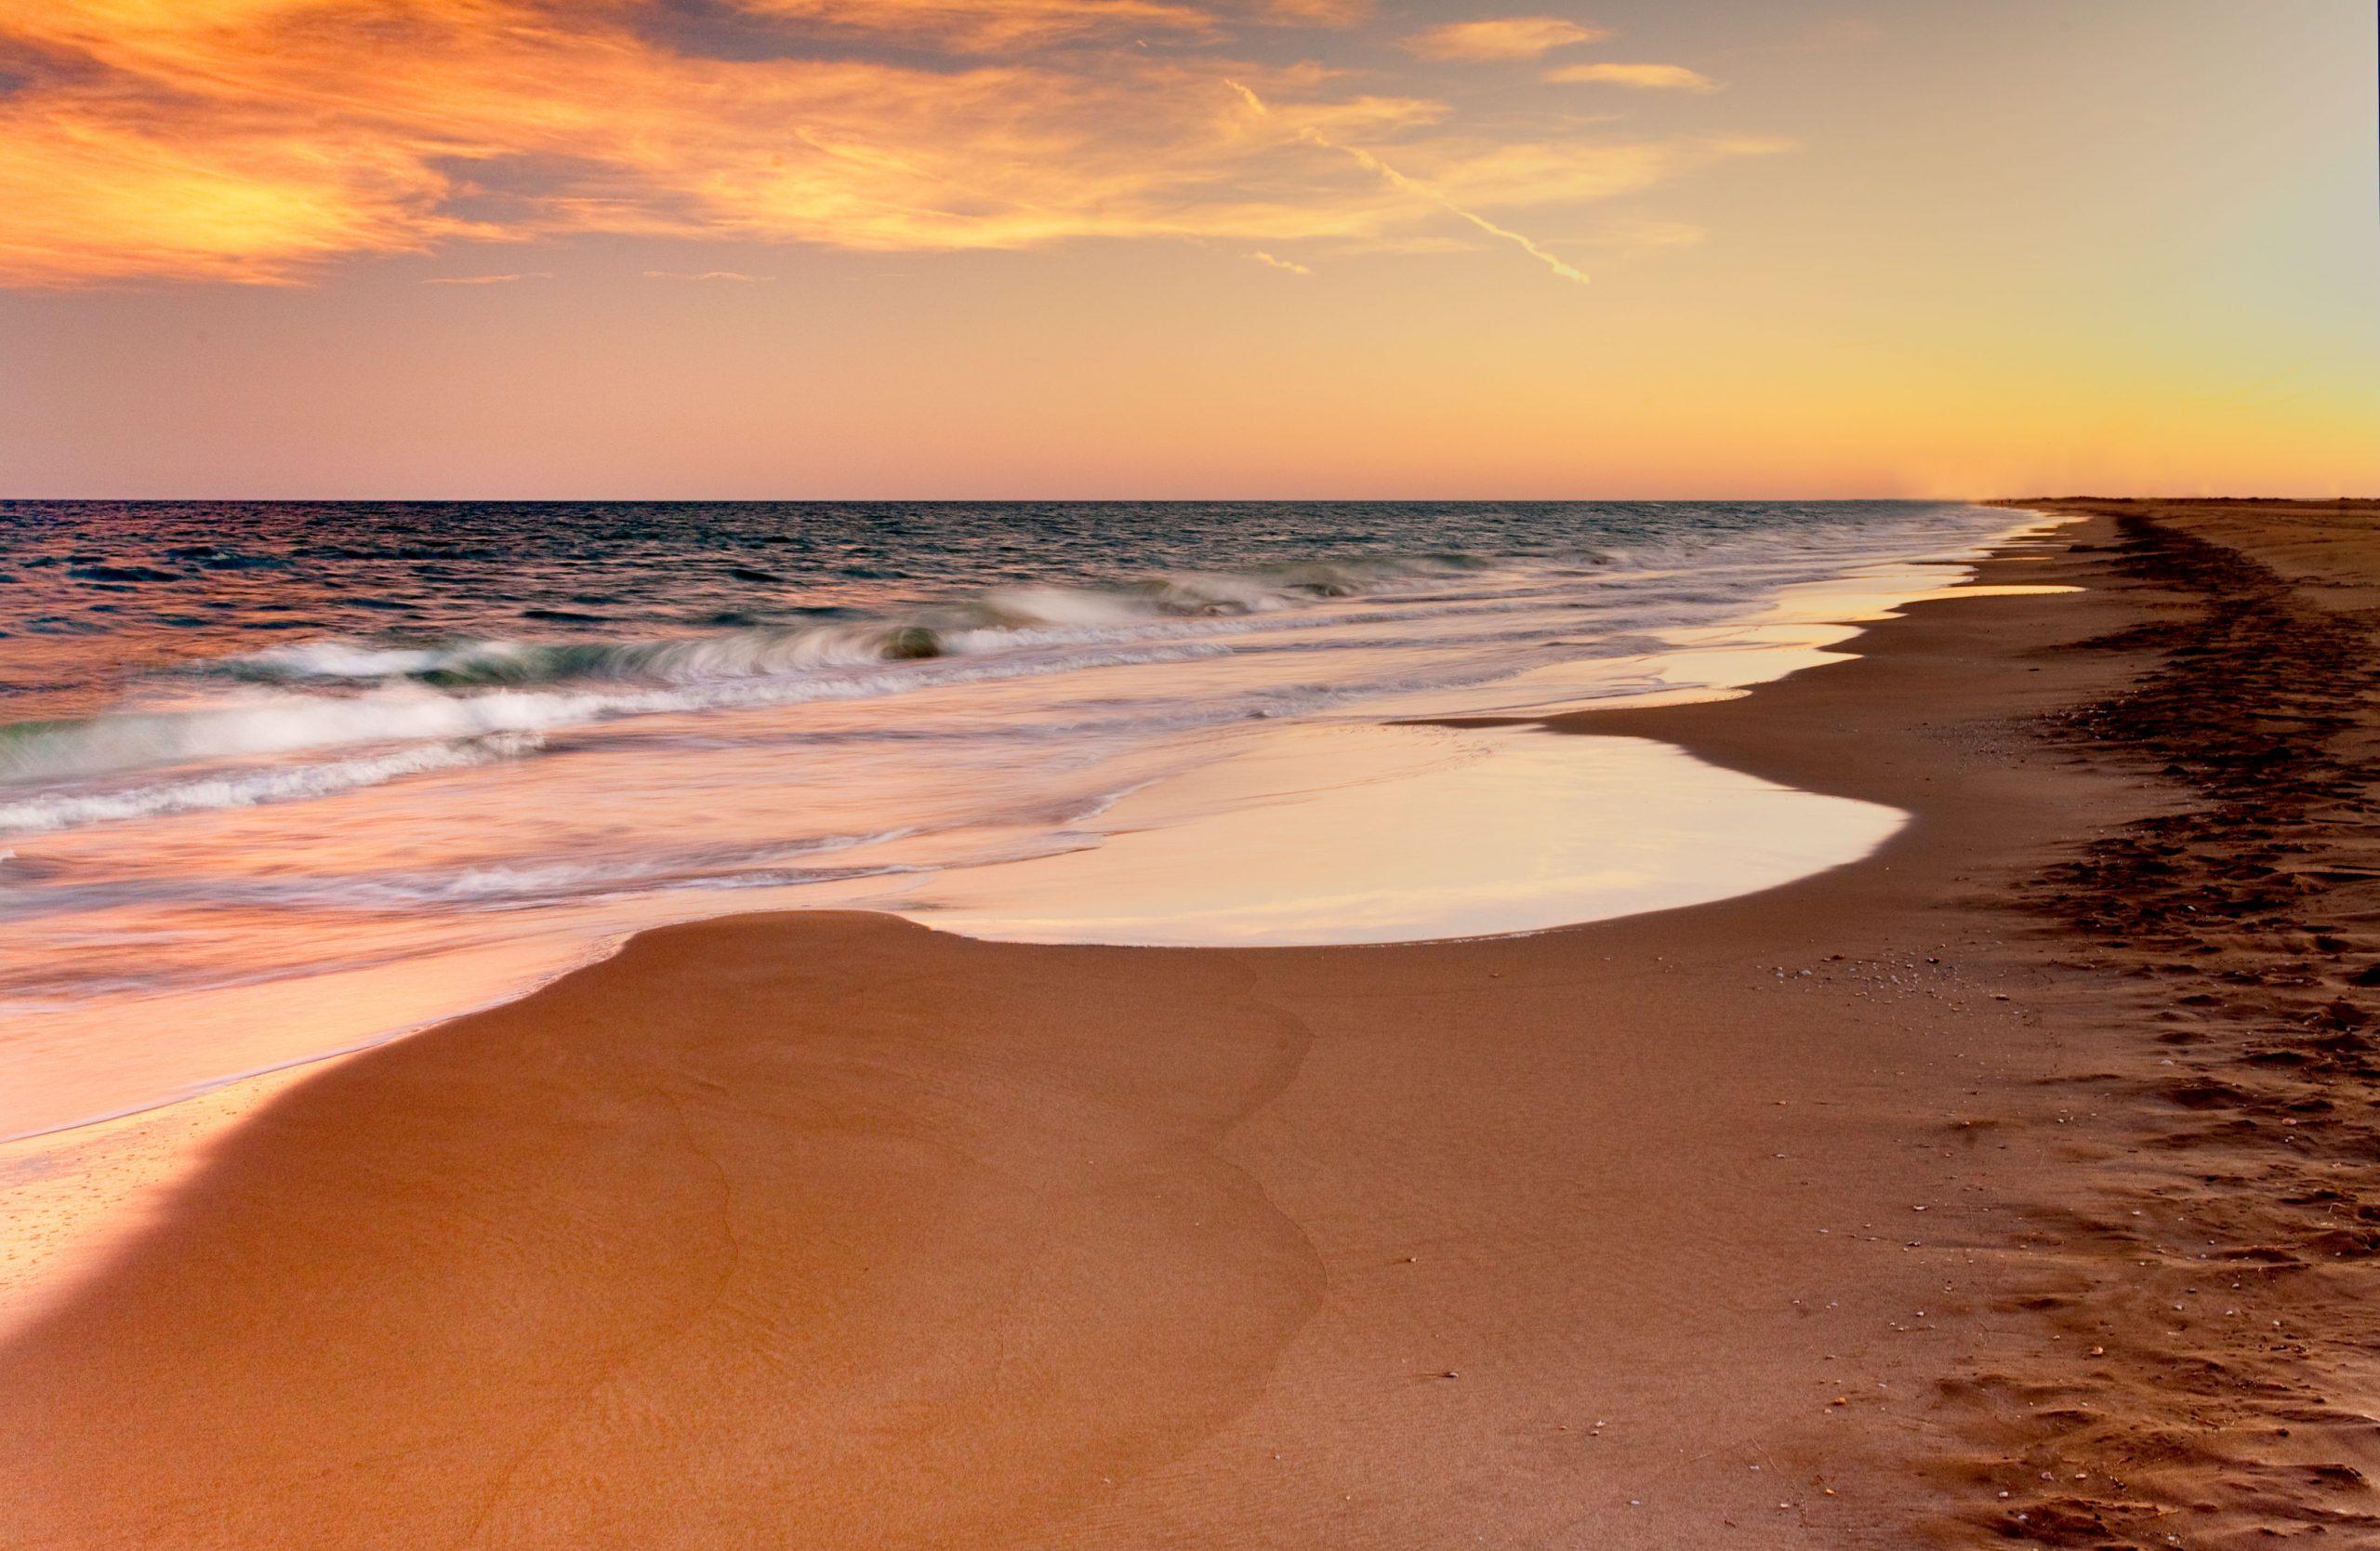 outdoor meeting Barcelona coastline beach sunset